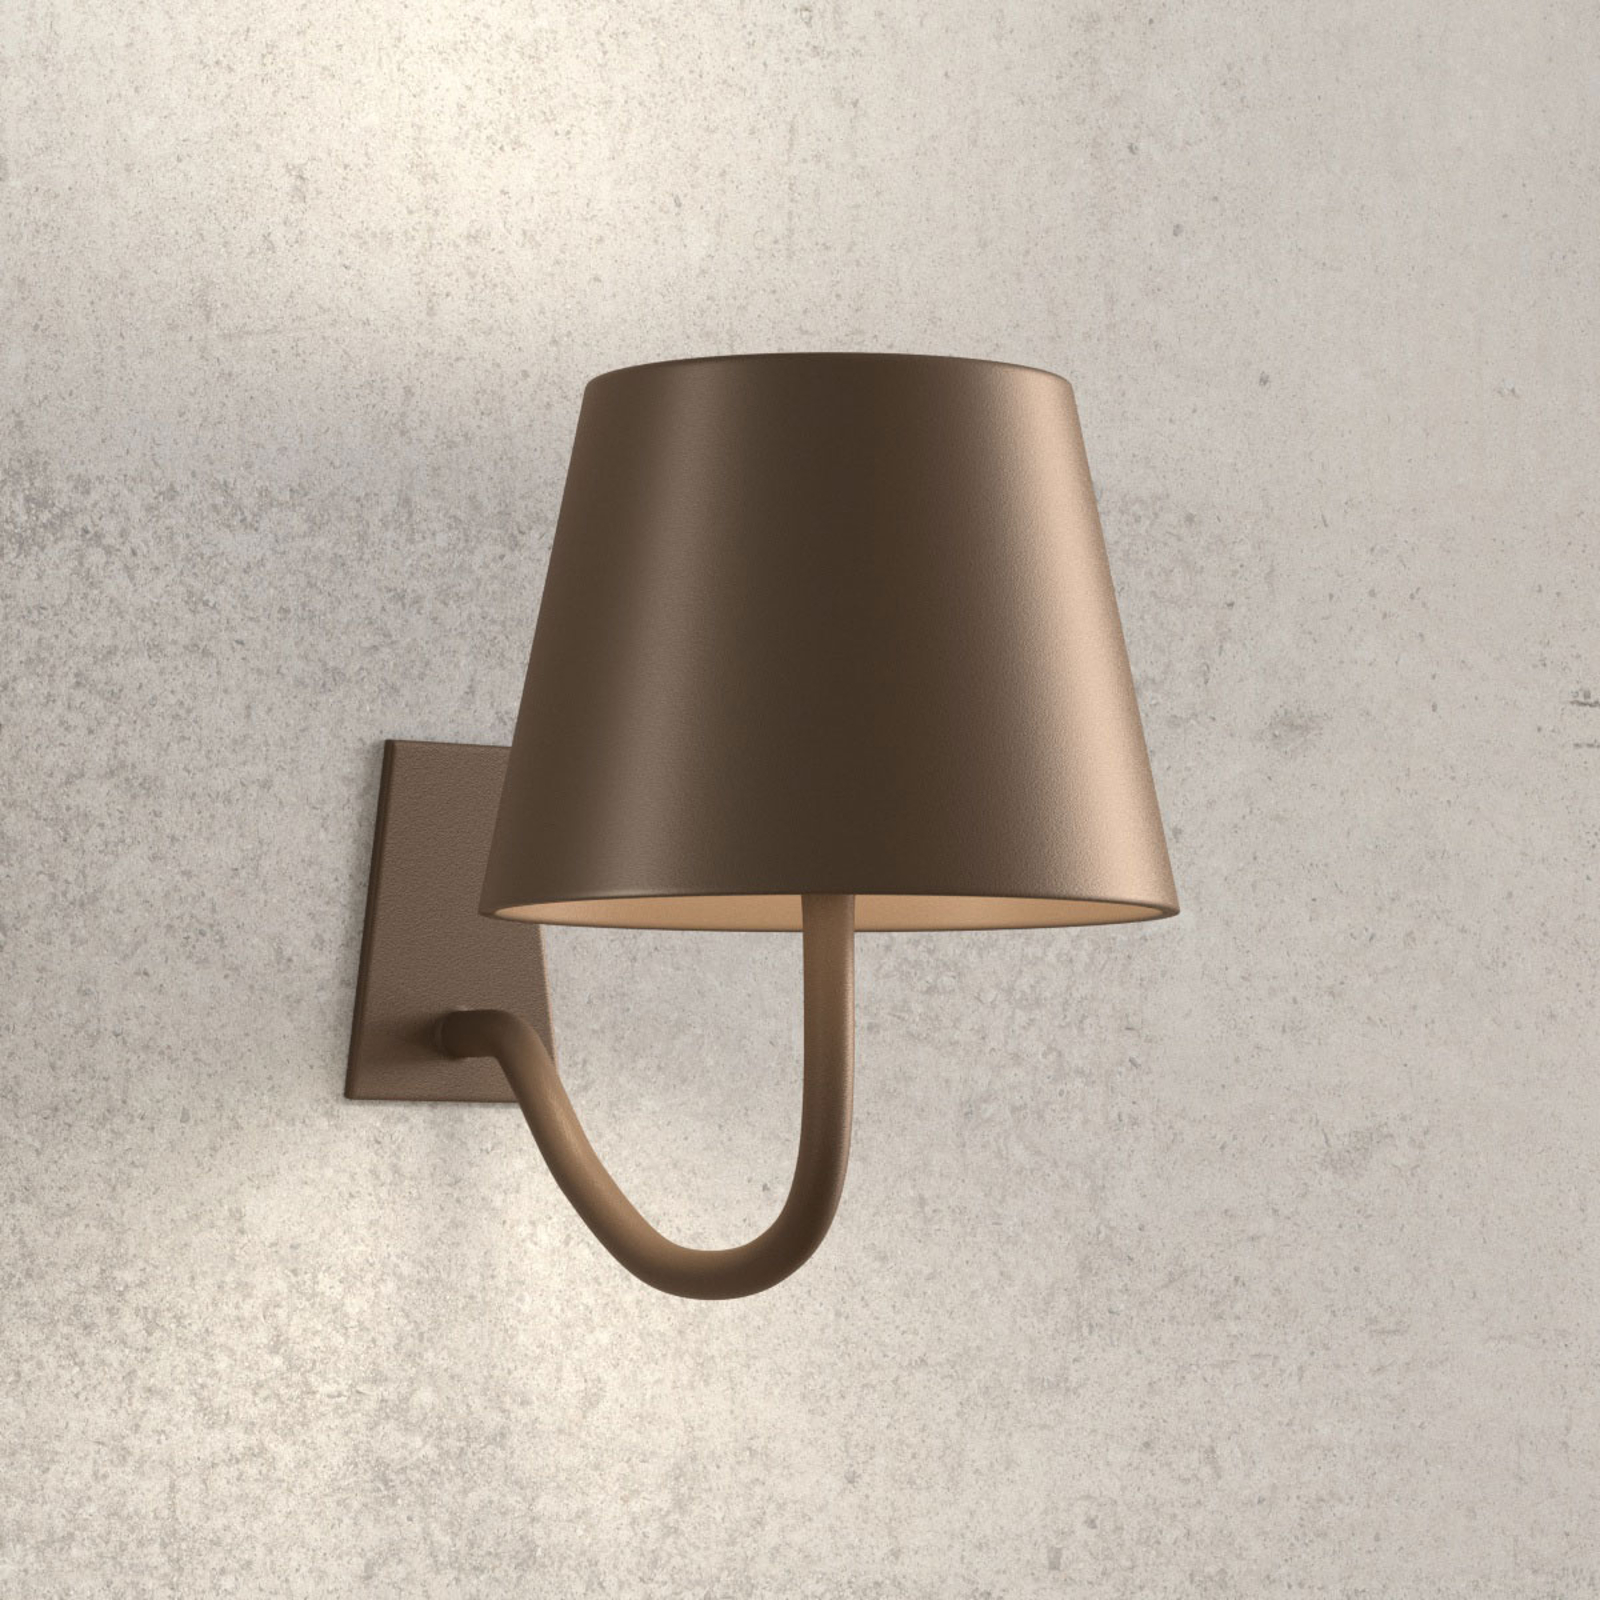 Applique LED Poldina dimmable, batterie, brun